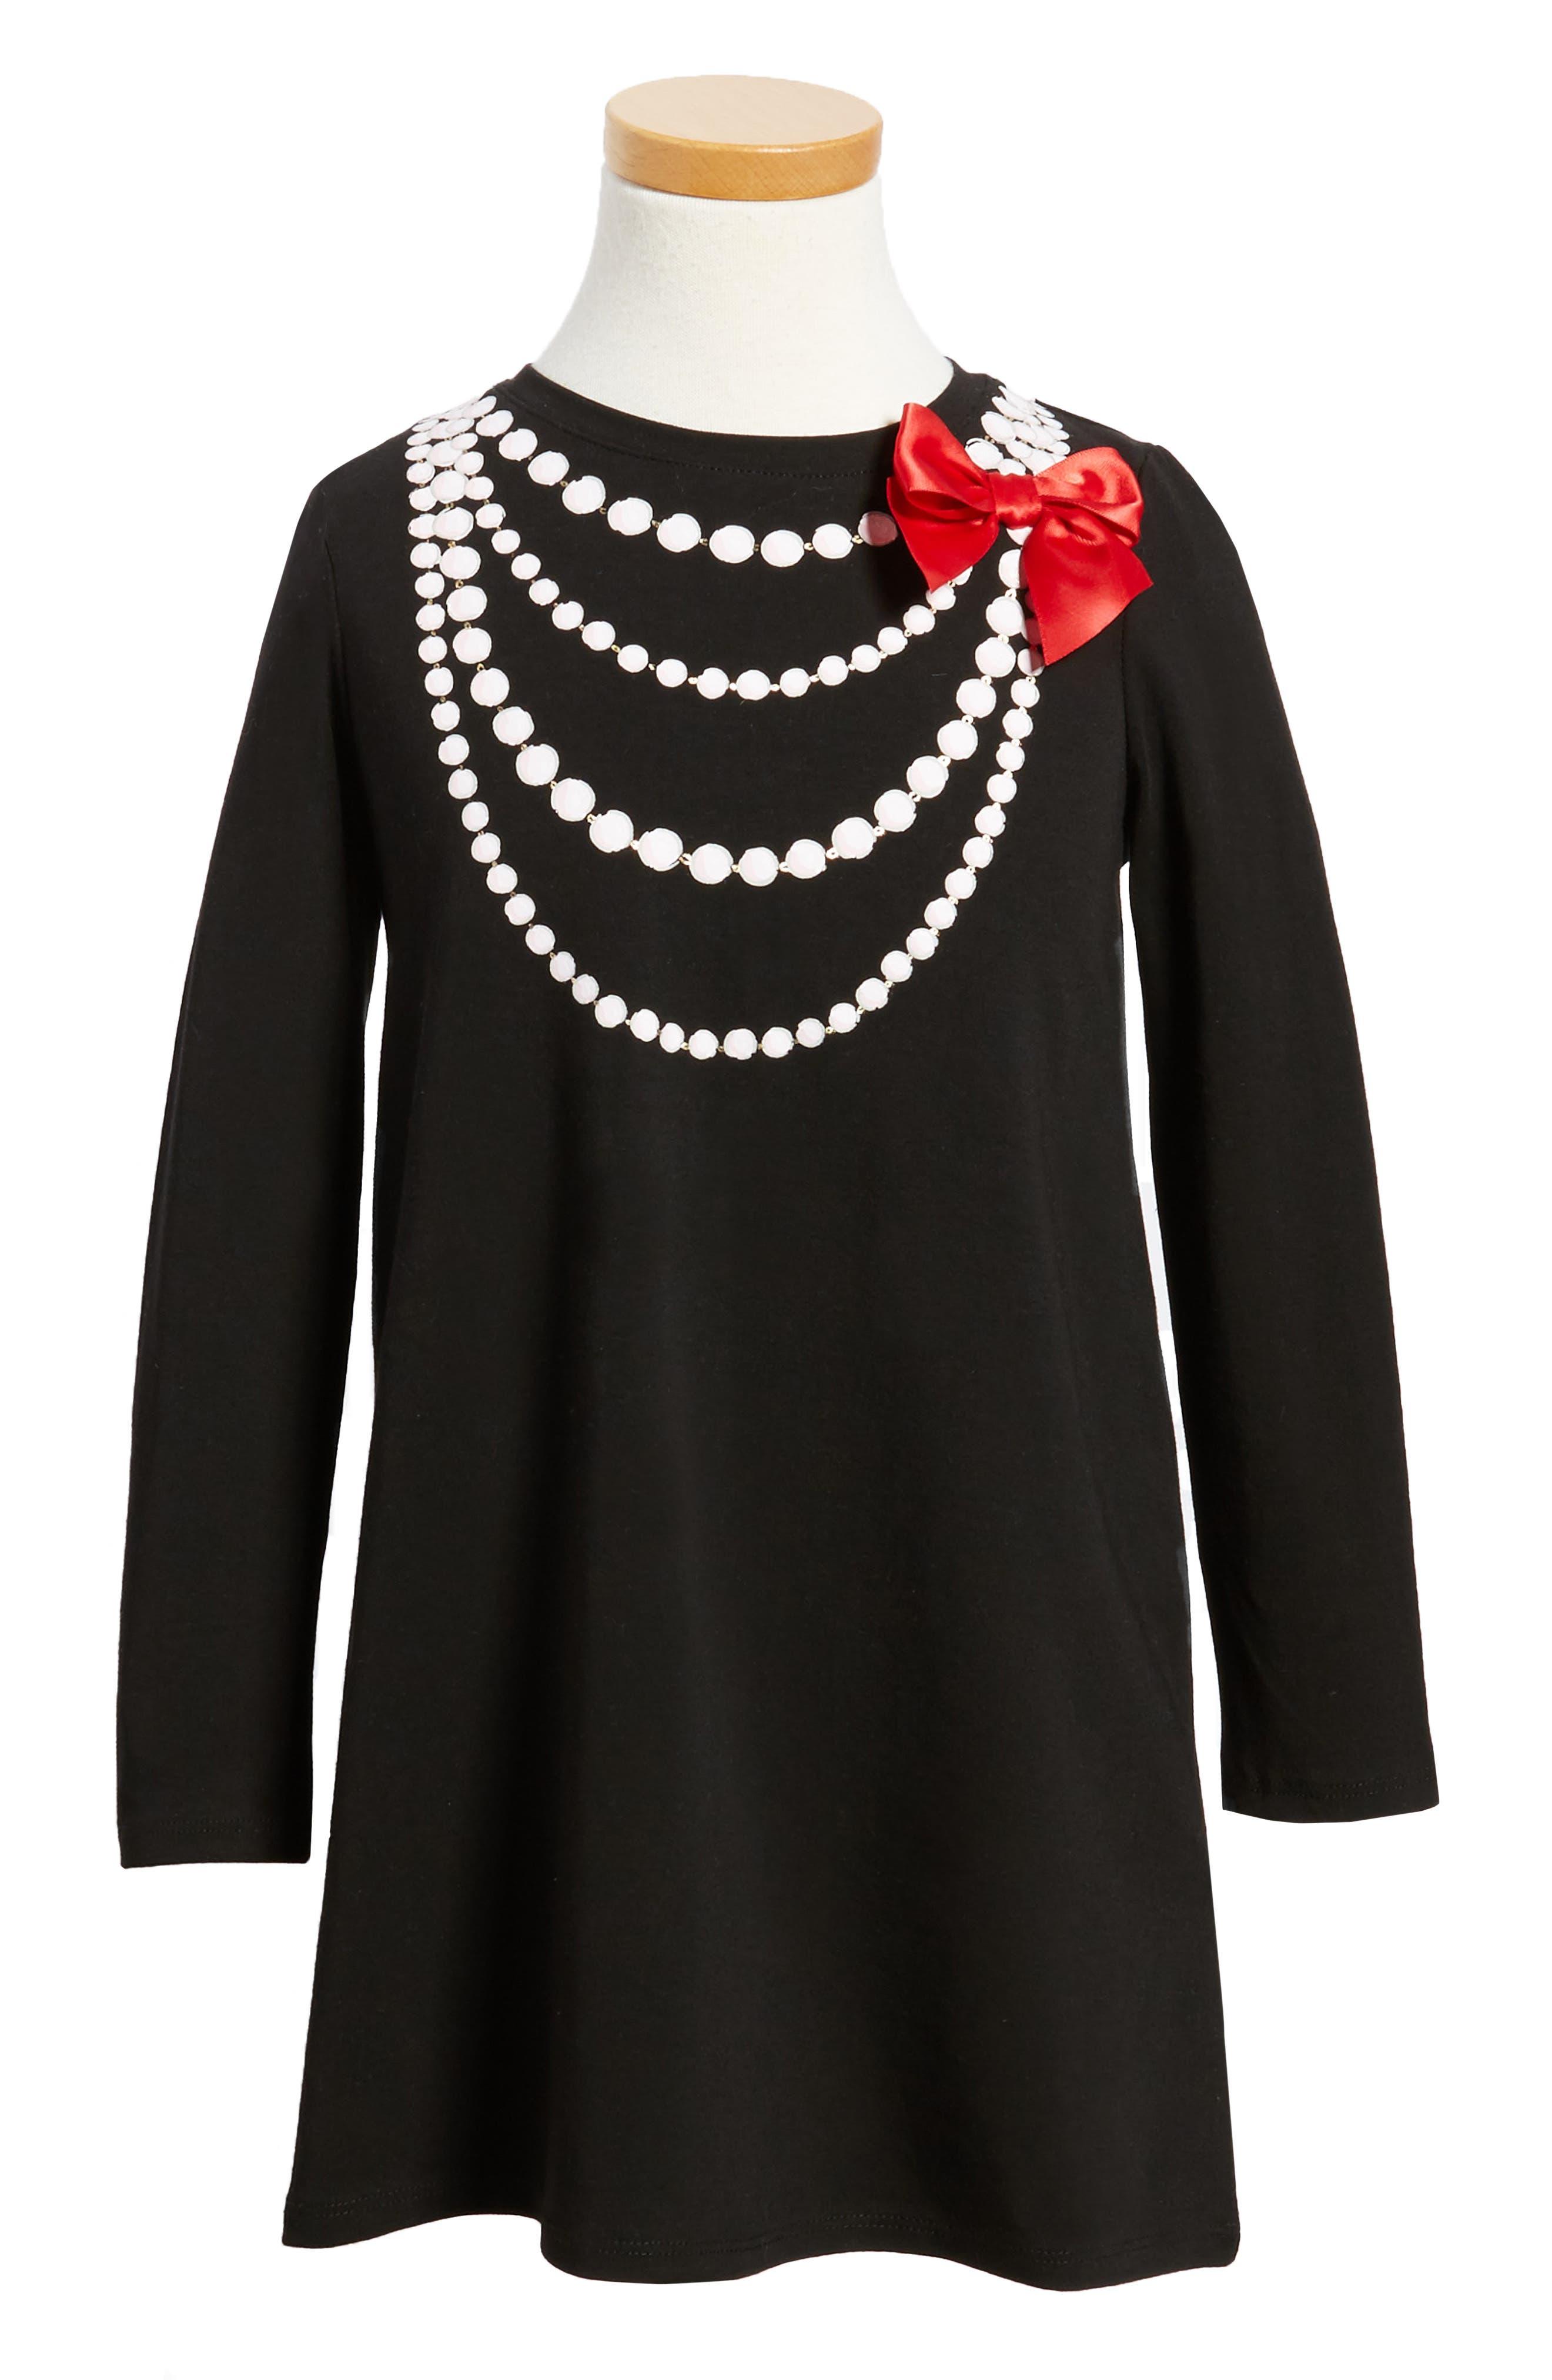 Alternate Image 1 Selected - kate spade new york trompe l'oeil dress (Toddler Girls & Little Girls)